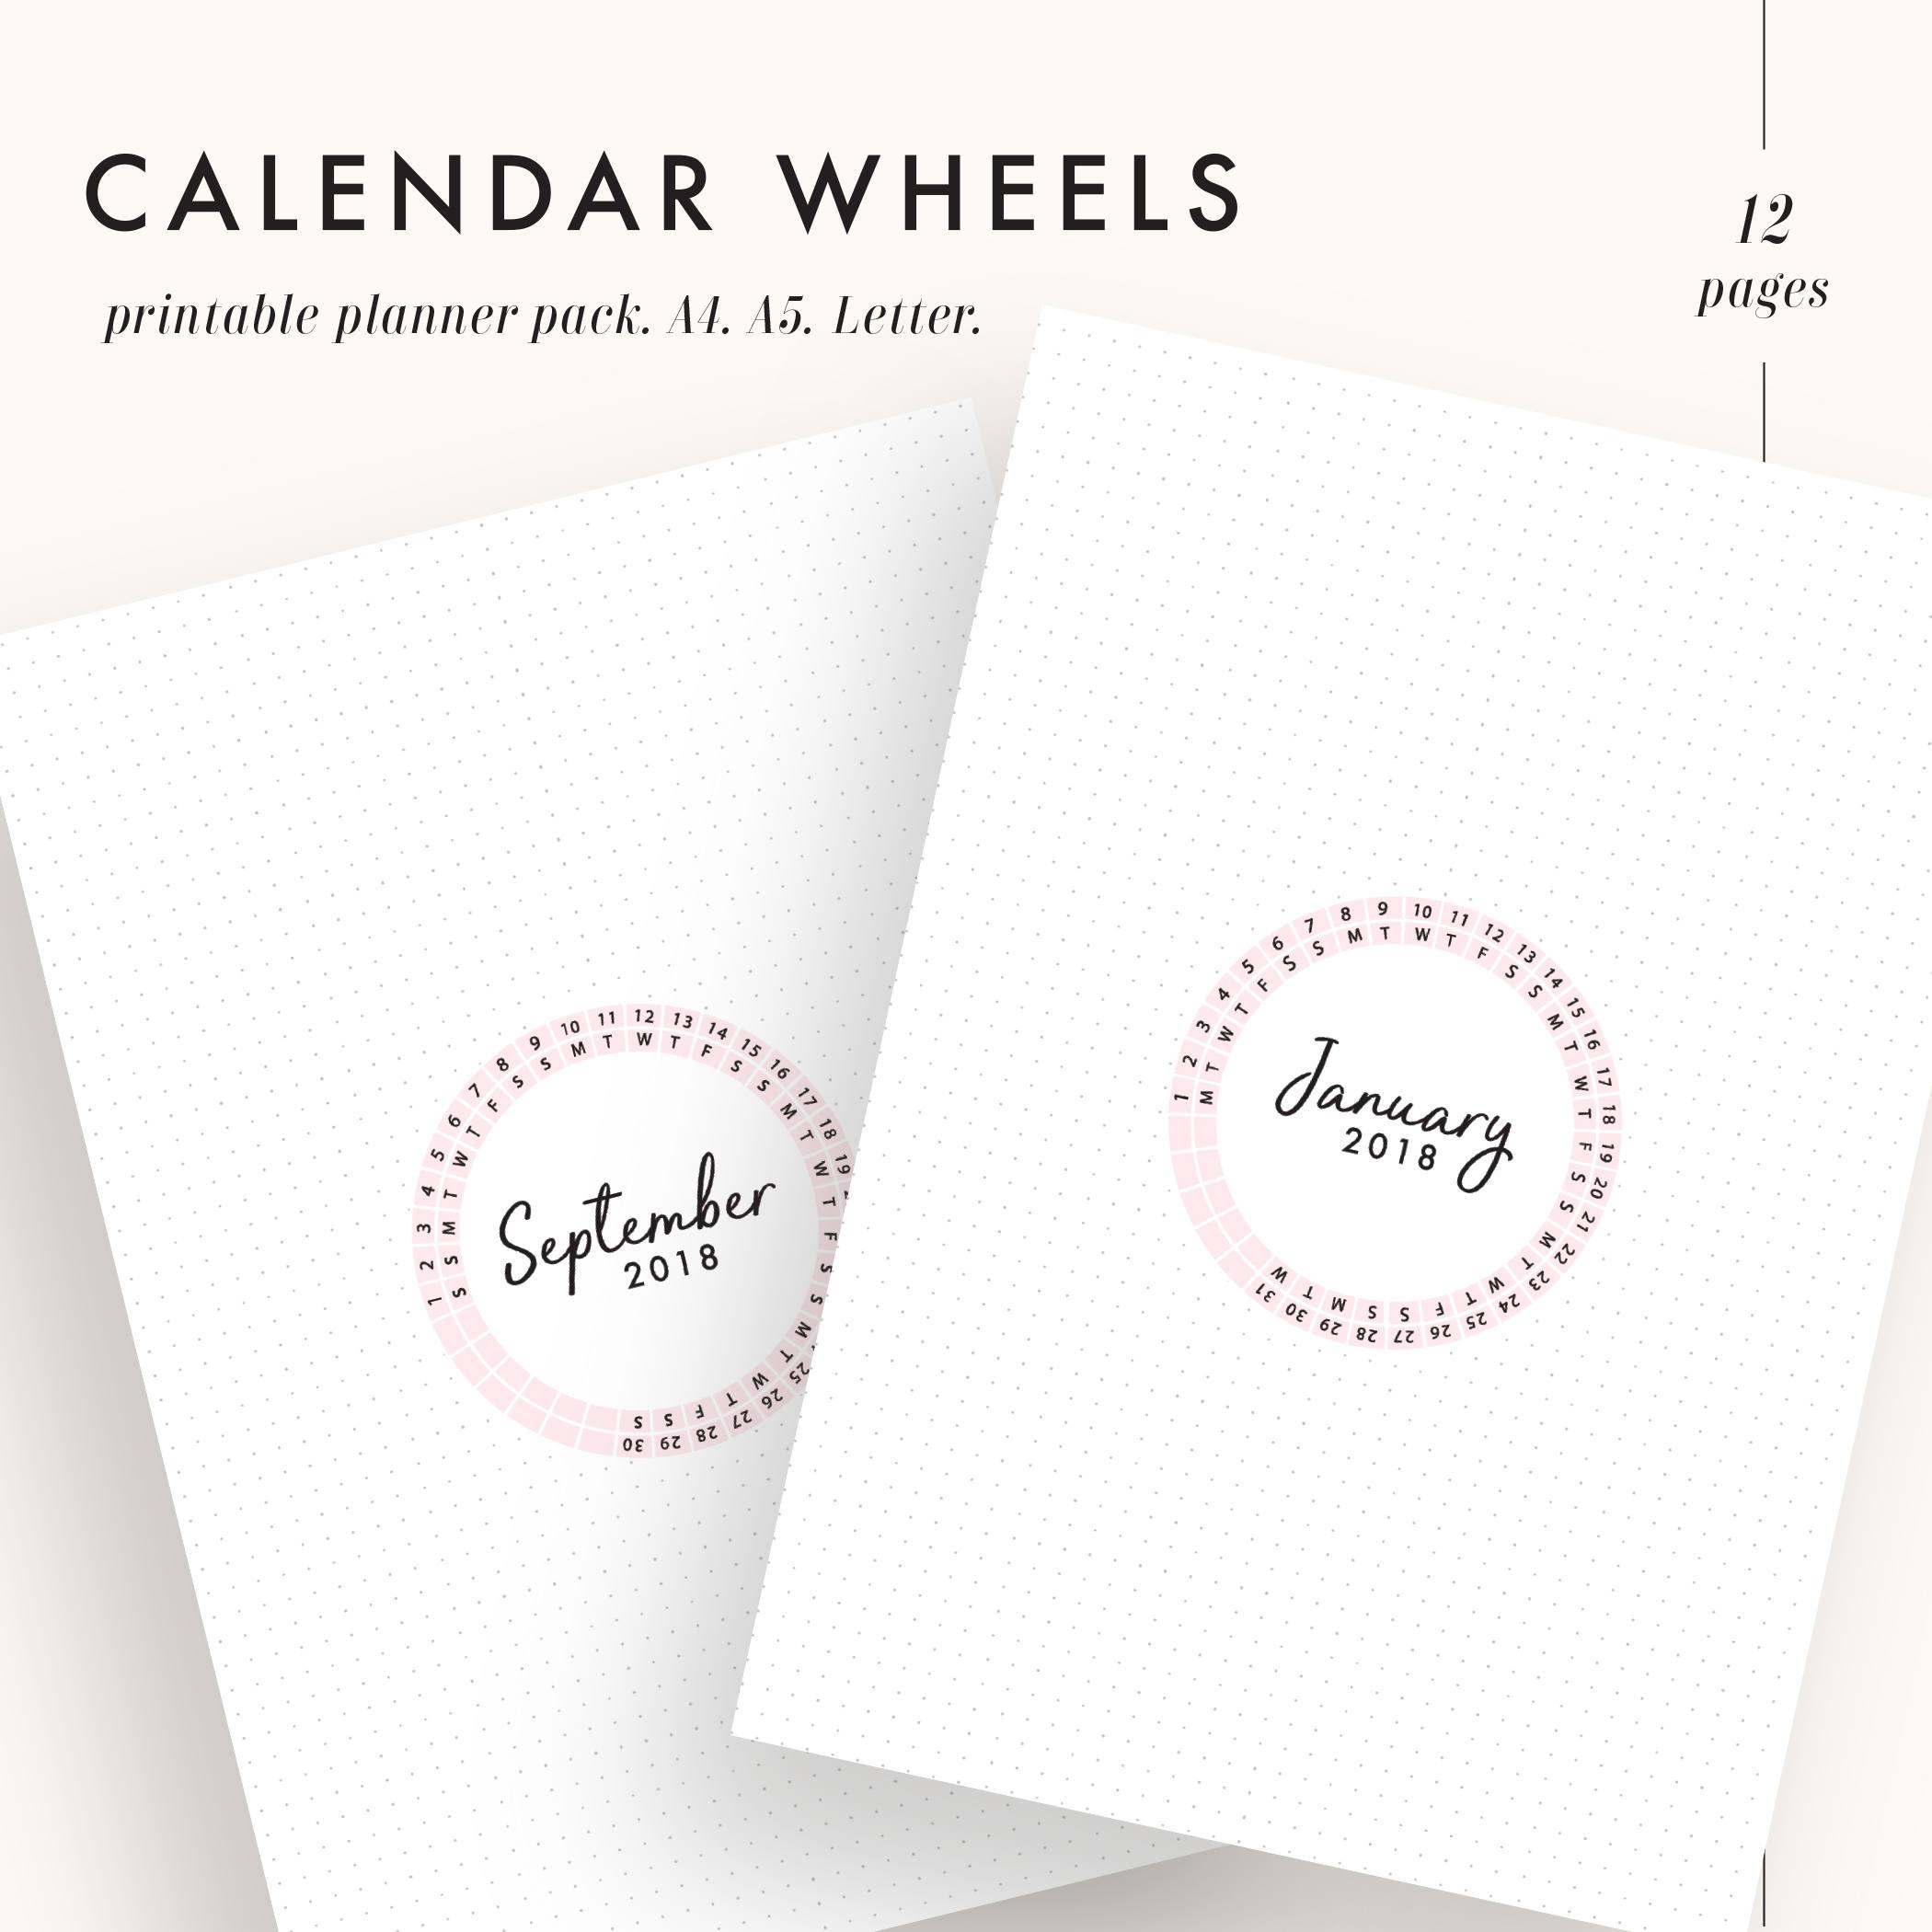 2018 Planner Inserts, 2018 Monthly Planner, 2018 Calendar Printable,  Calendar Wheel, 2018 Wall Calendar, Calendar Inserts, A4, A5, Letter with Calendar Wheel Printable